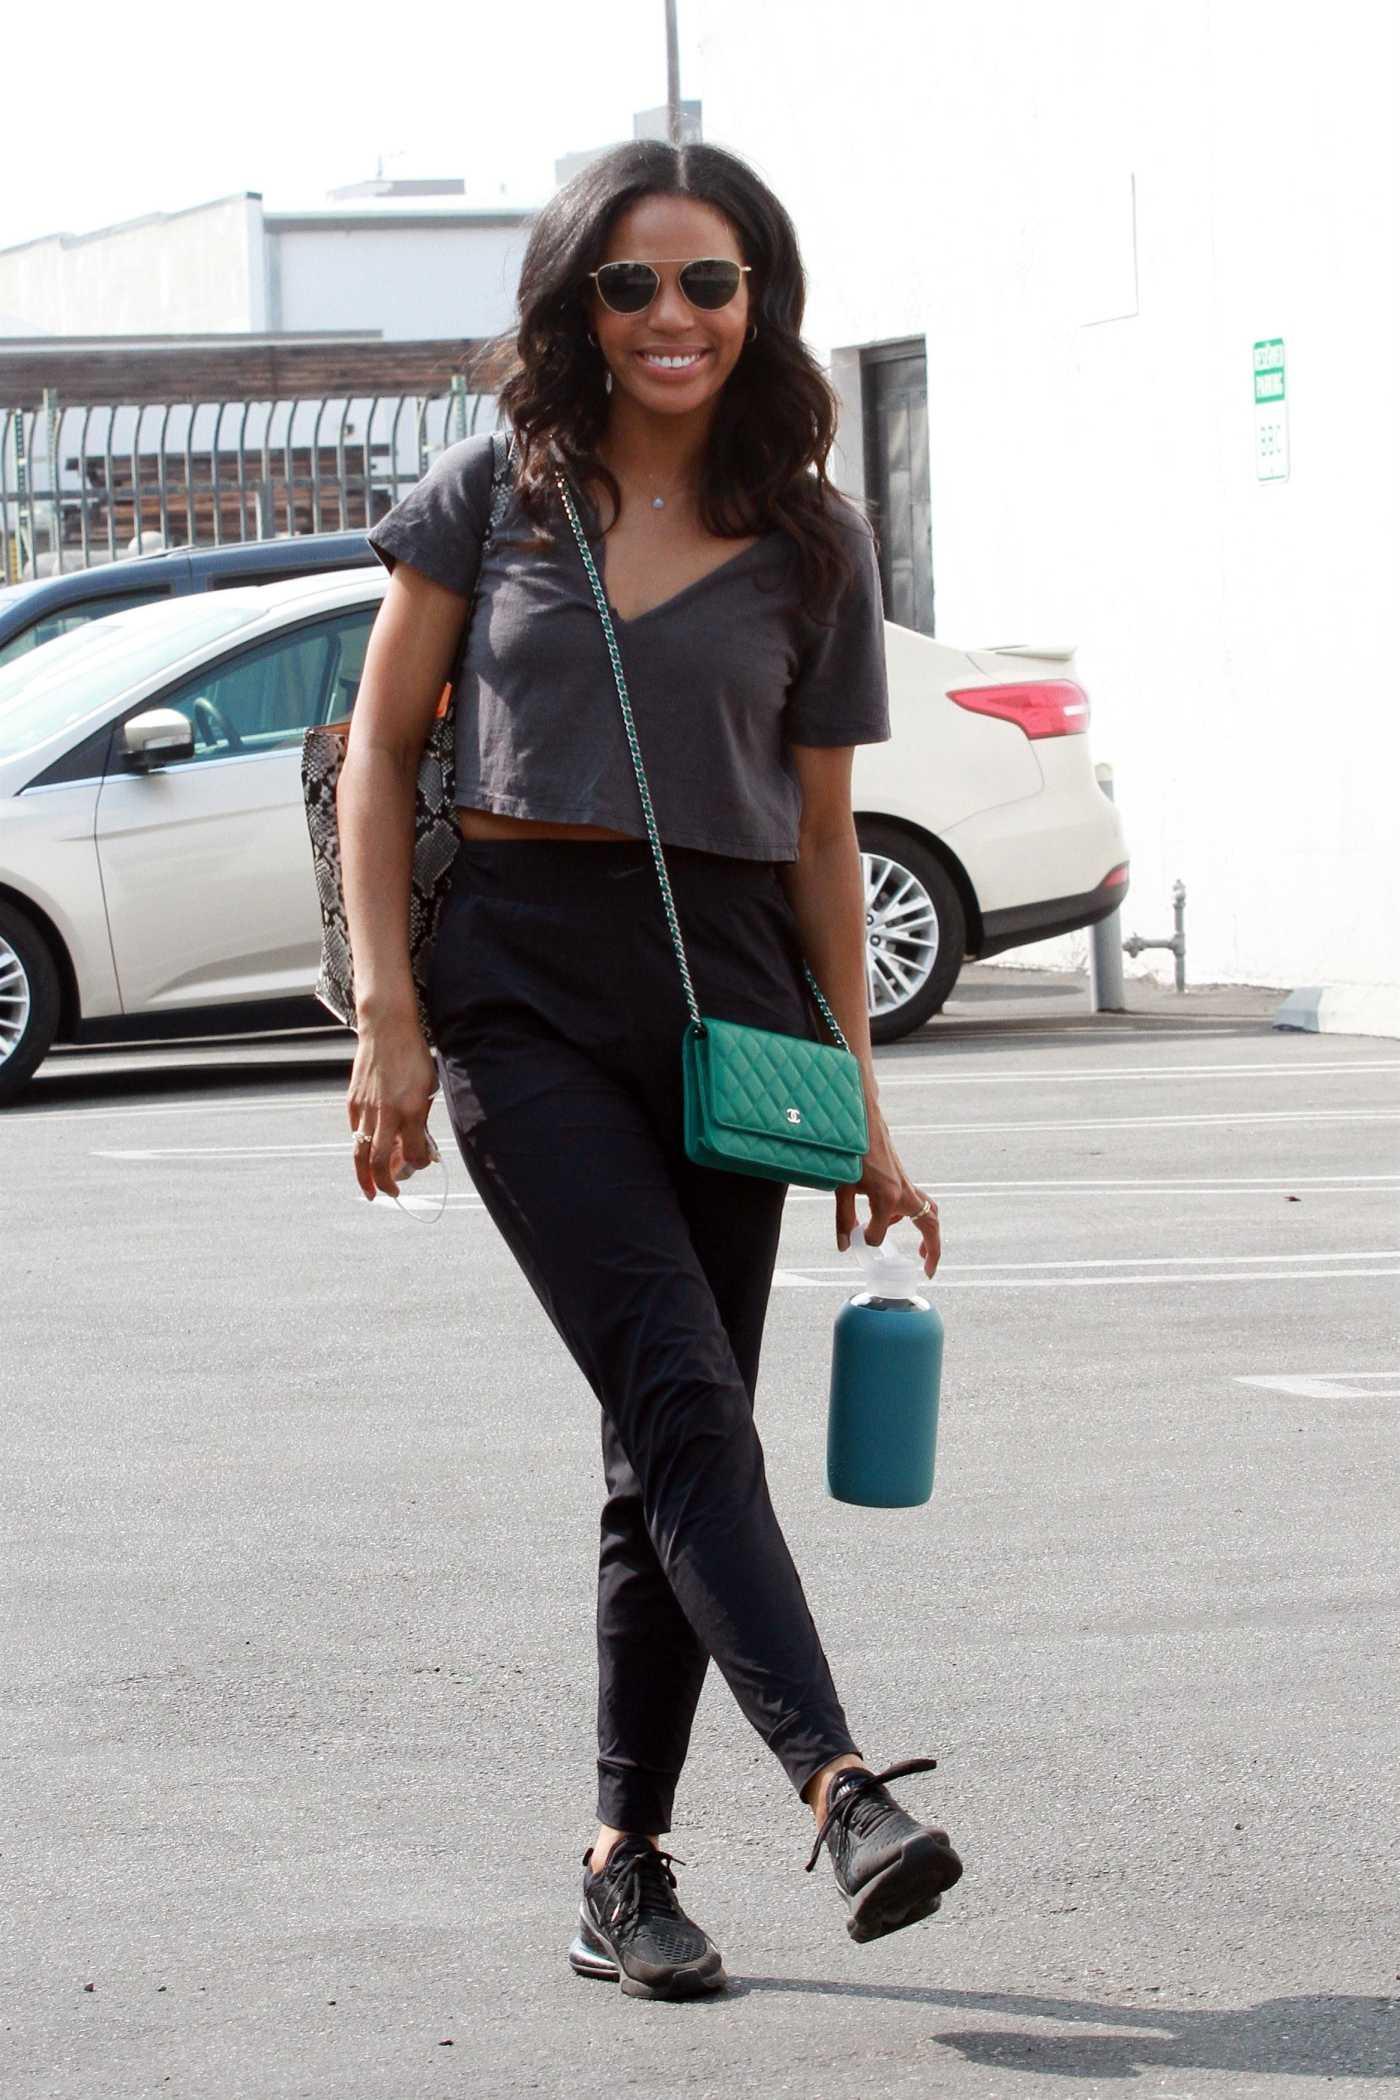 Britt Stewart in a Black Sneakers Arrives at Practice at the Dance Studio in Los Angeles 09/16/2020